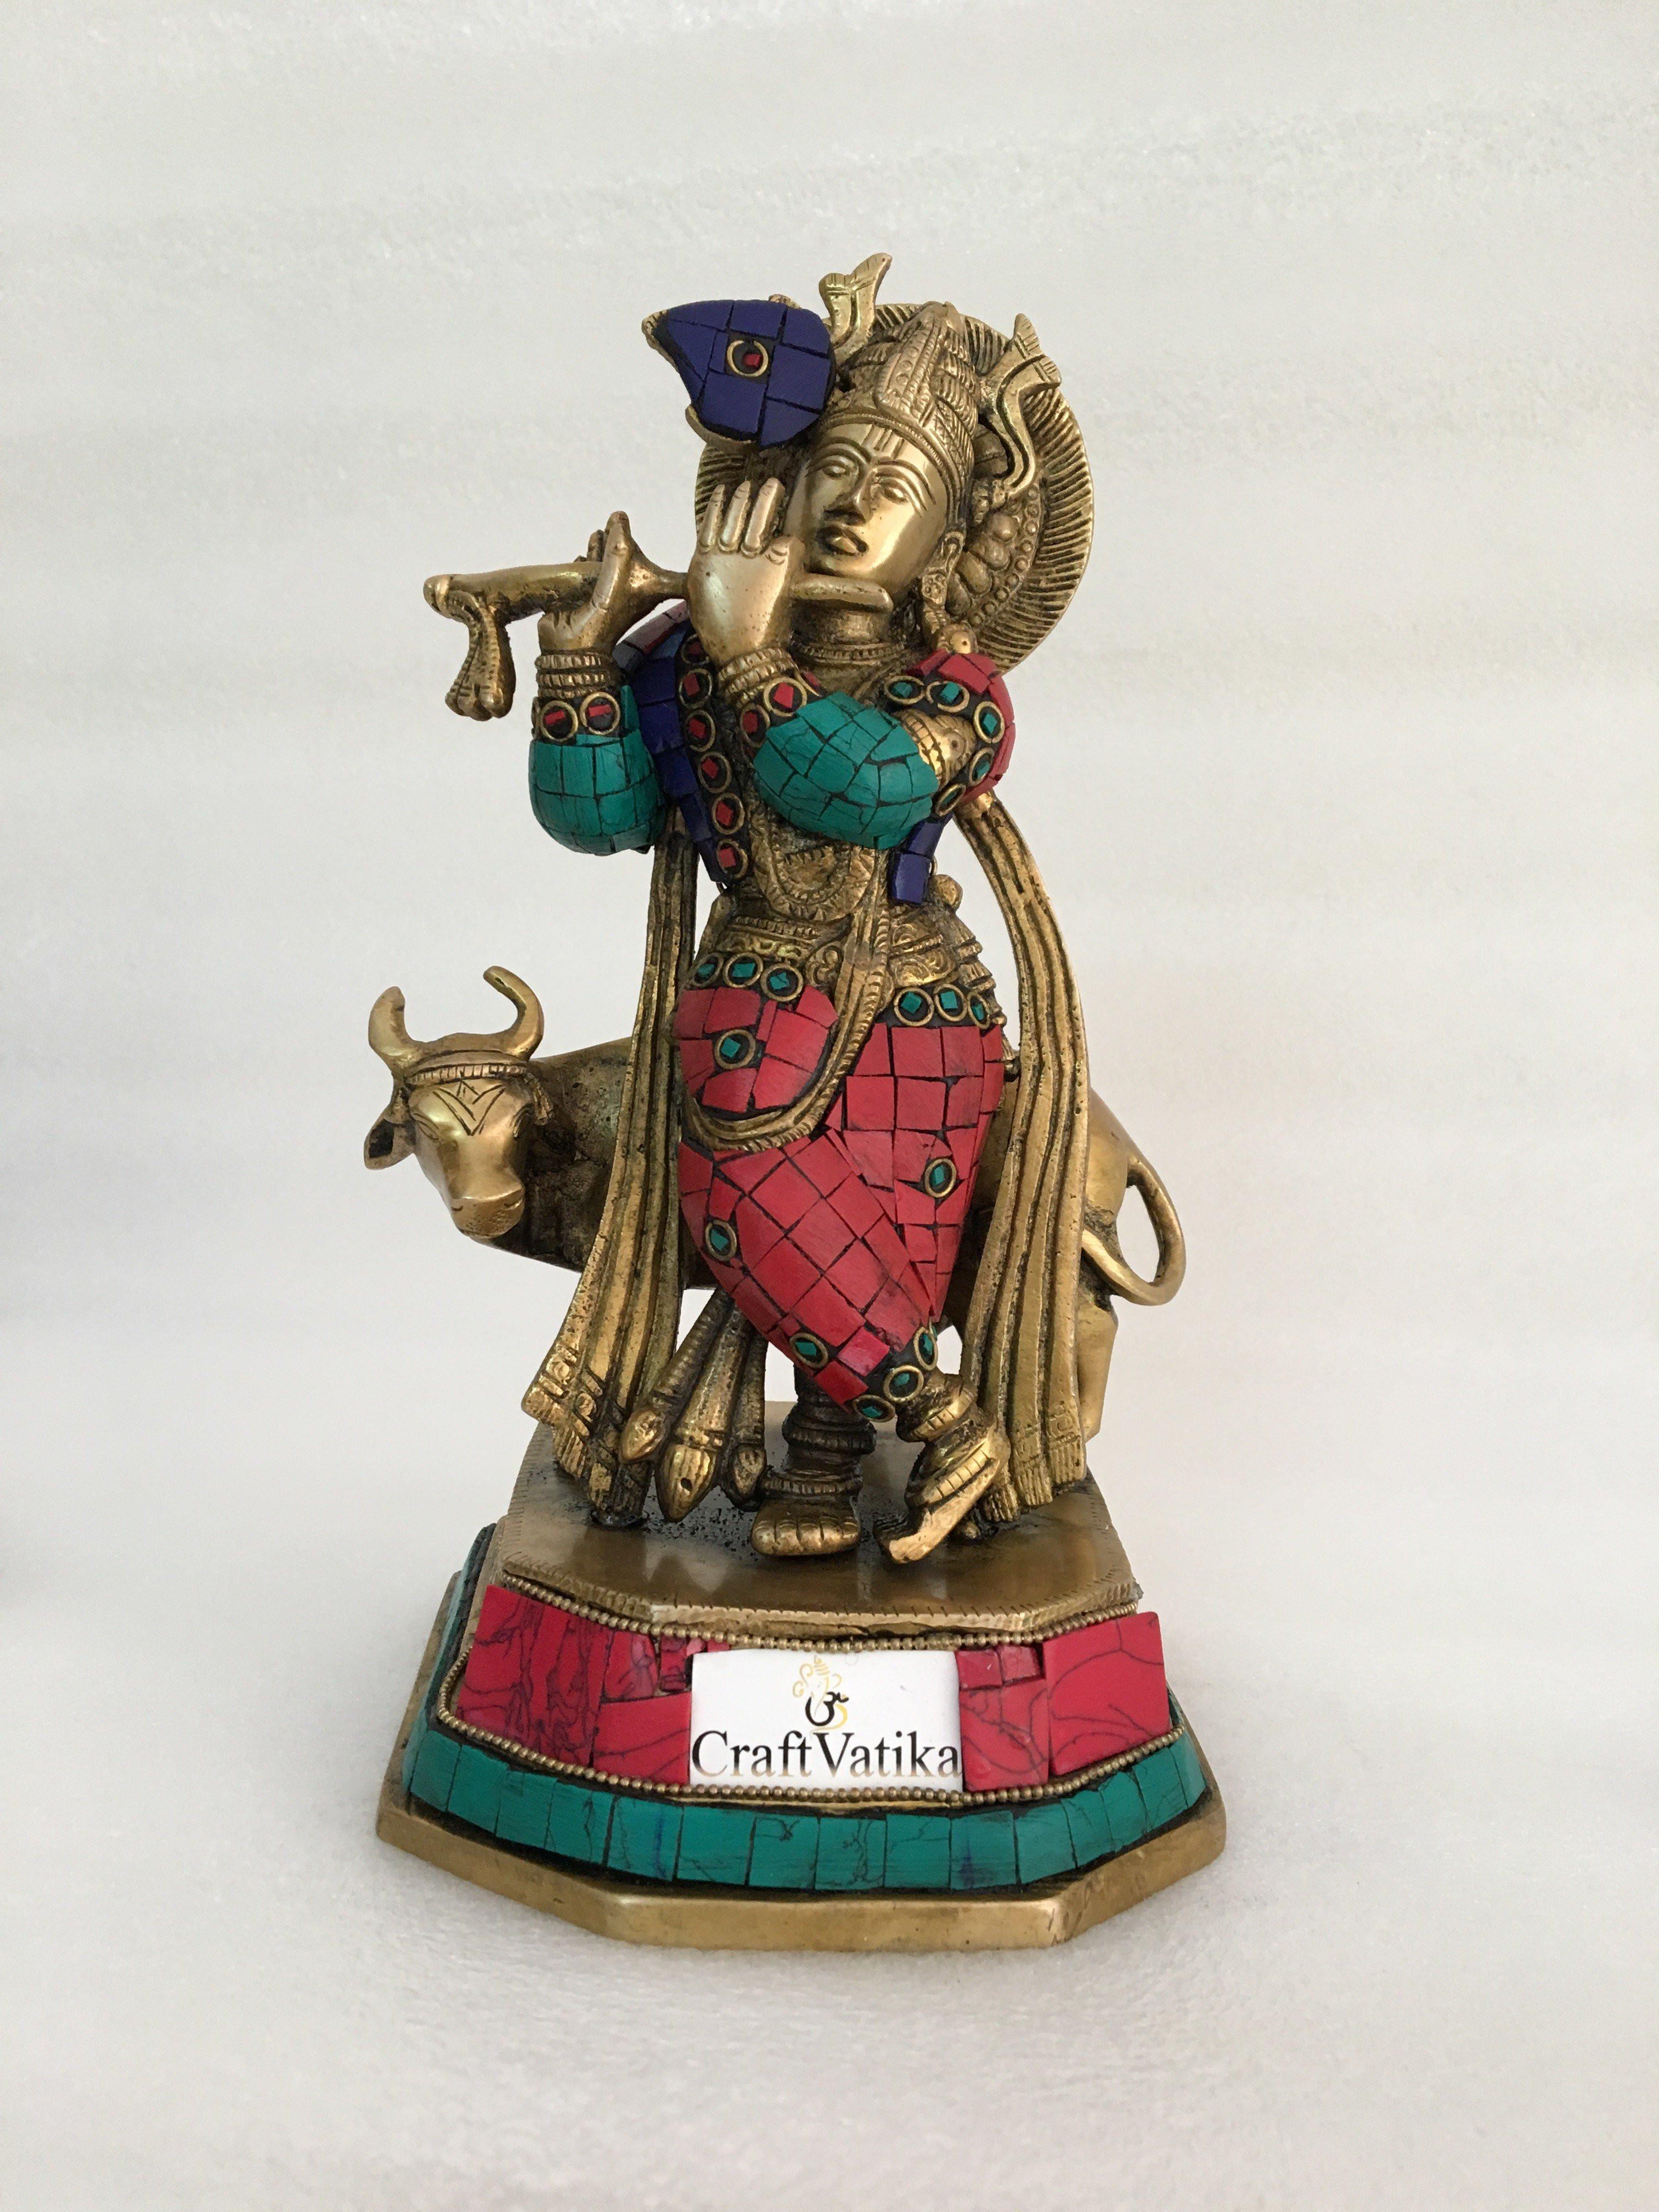 brass bud vase india of large brass cow krishna statue hindu god krishan beautiful sculpture pertaining to large brass cow krishna statue hindu god krishan beautiful sculpture